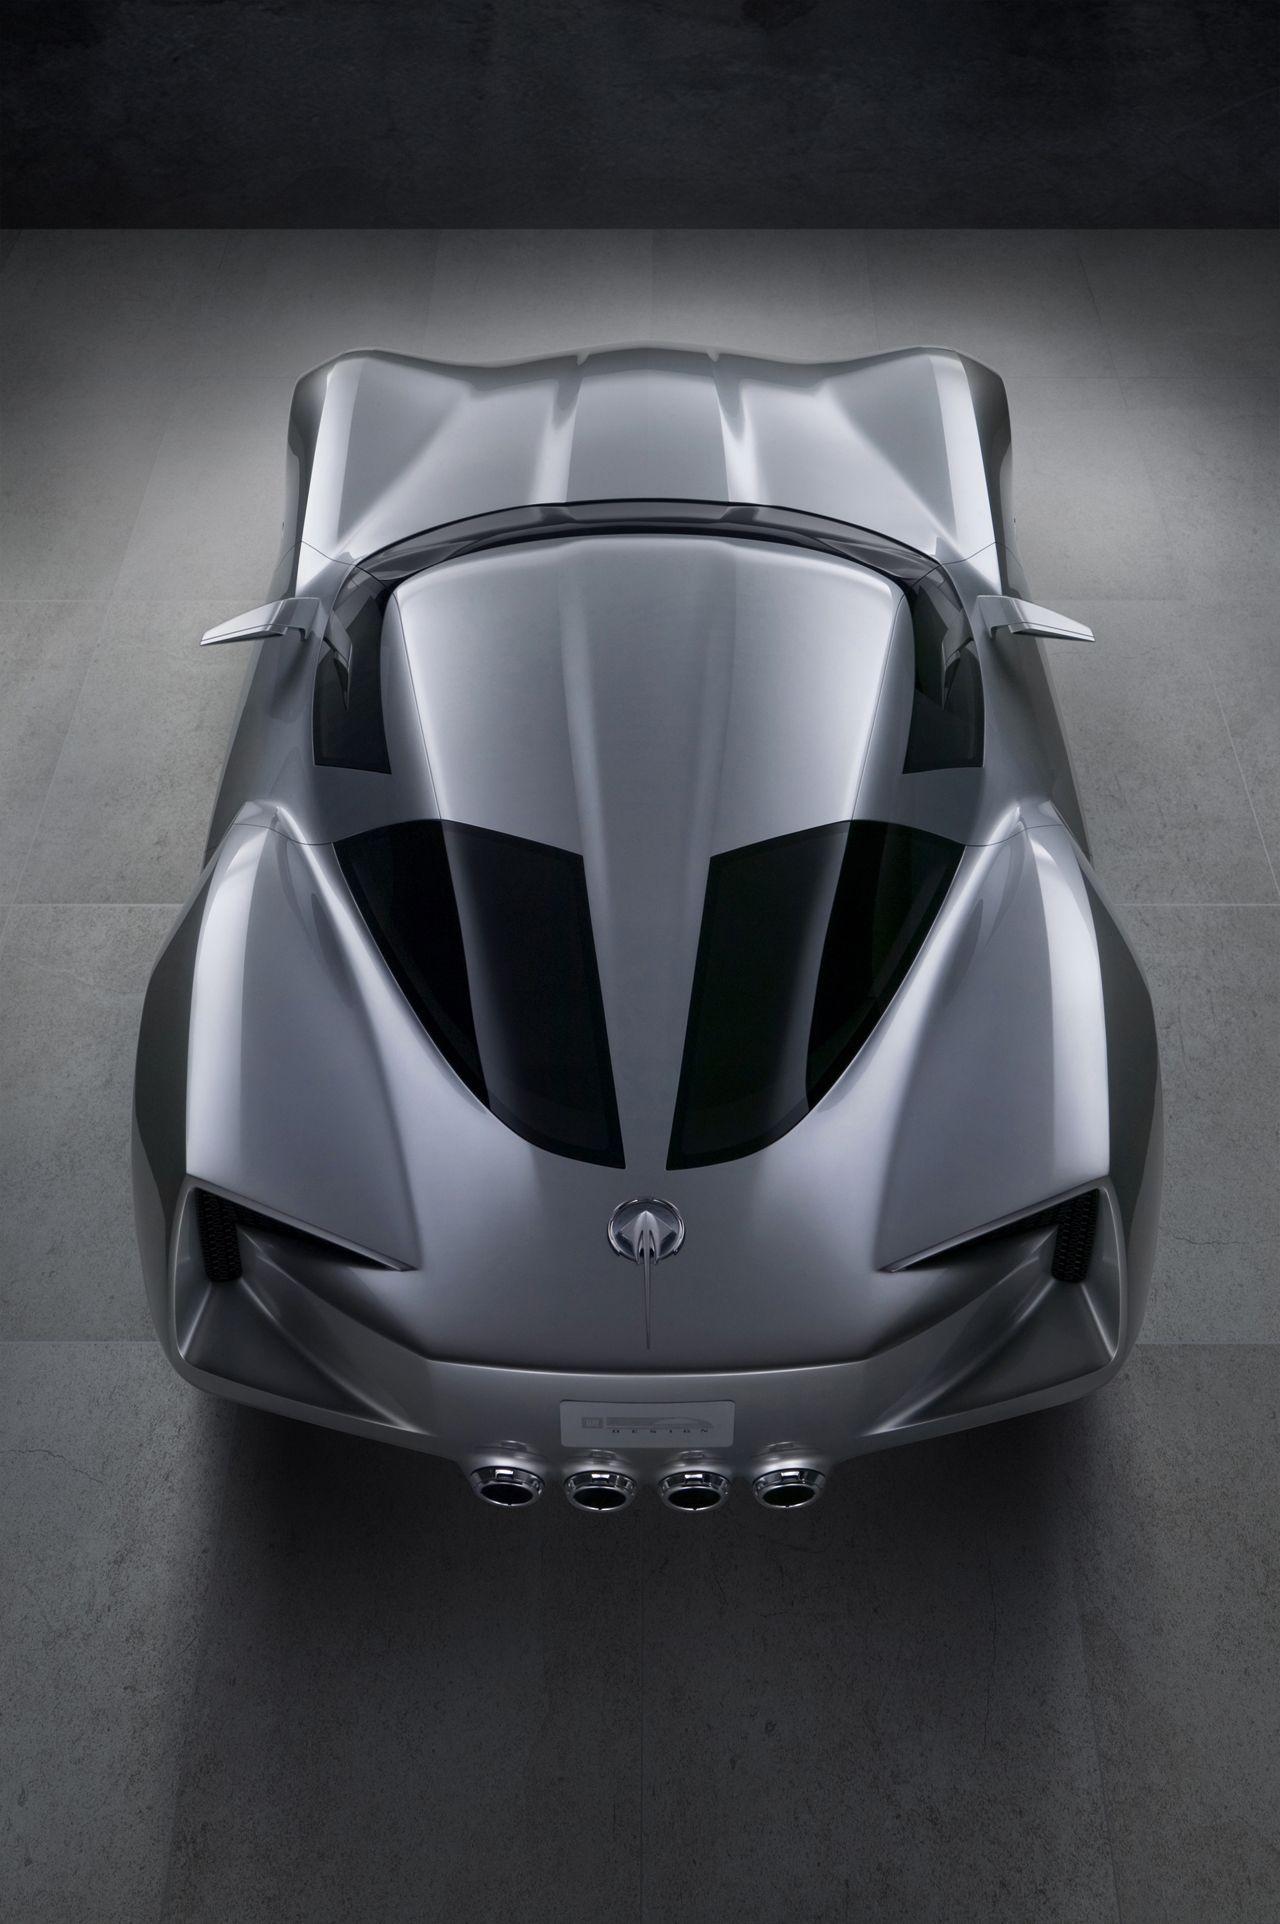 Chevrolet Corvette Stingray Concept 2009 Corvette